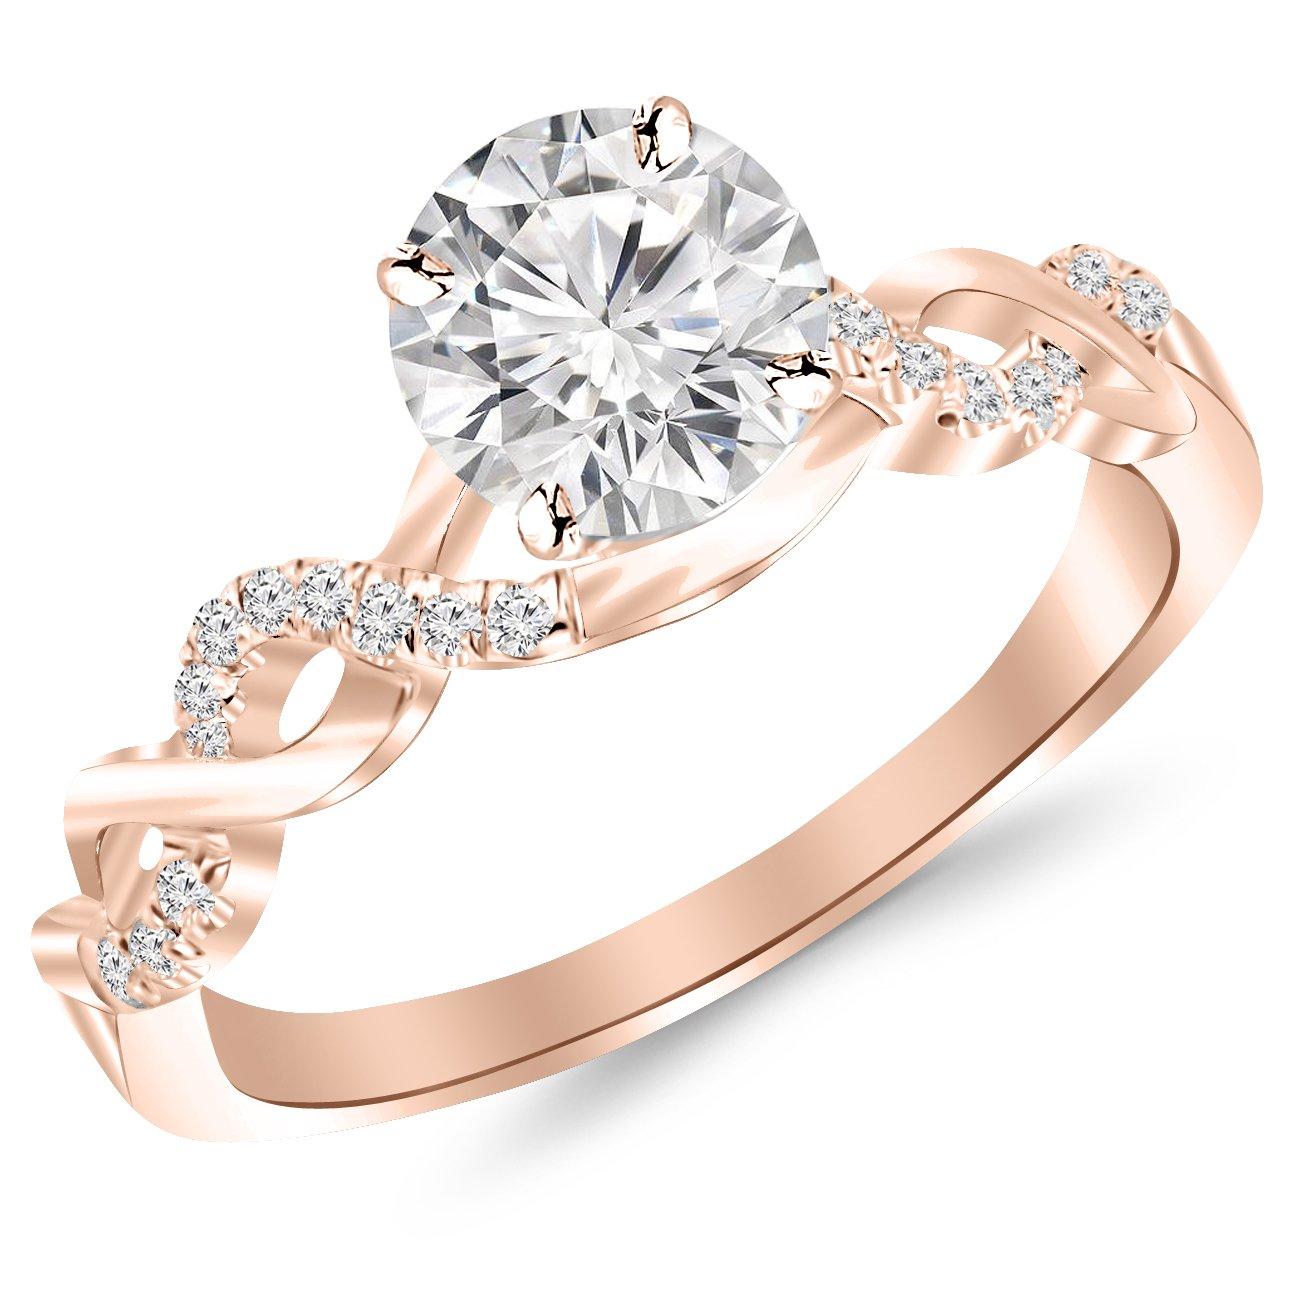 0.98 Carat Twisting Infinity Gold and Diamond Split Shank Pave Set Diamond Engagement Ring 14K Rose Gold with a 0.83 Carat I-J VS1-VS2 Center by Houston Diamond District